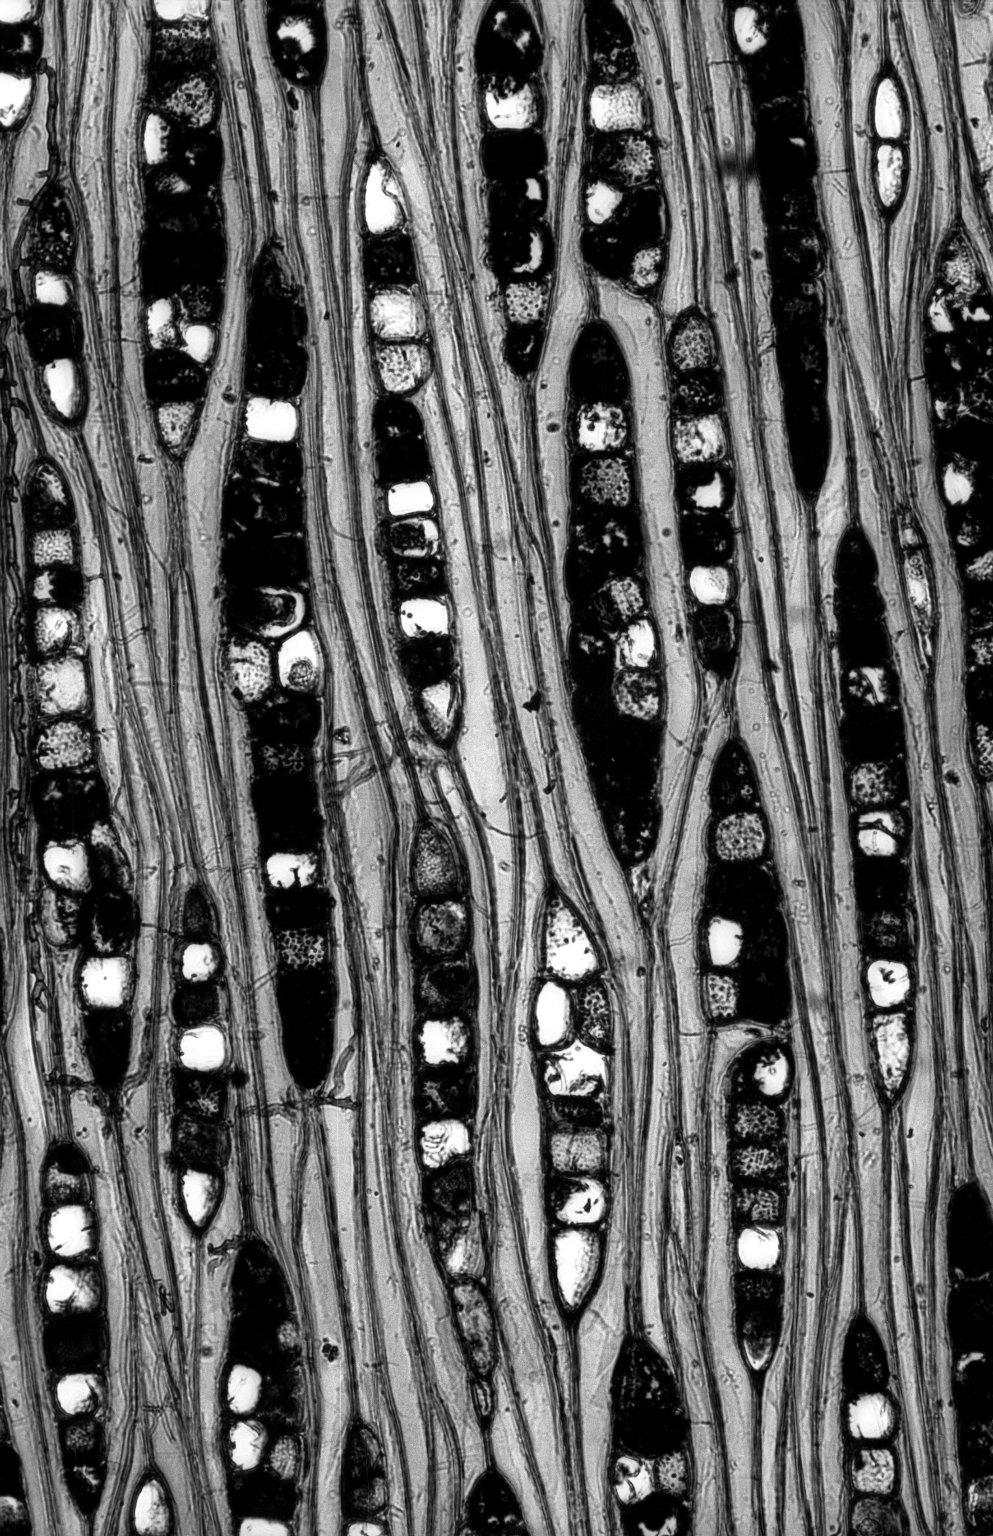 ANACARDIACEAE Anacardium occidentale